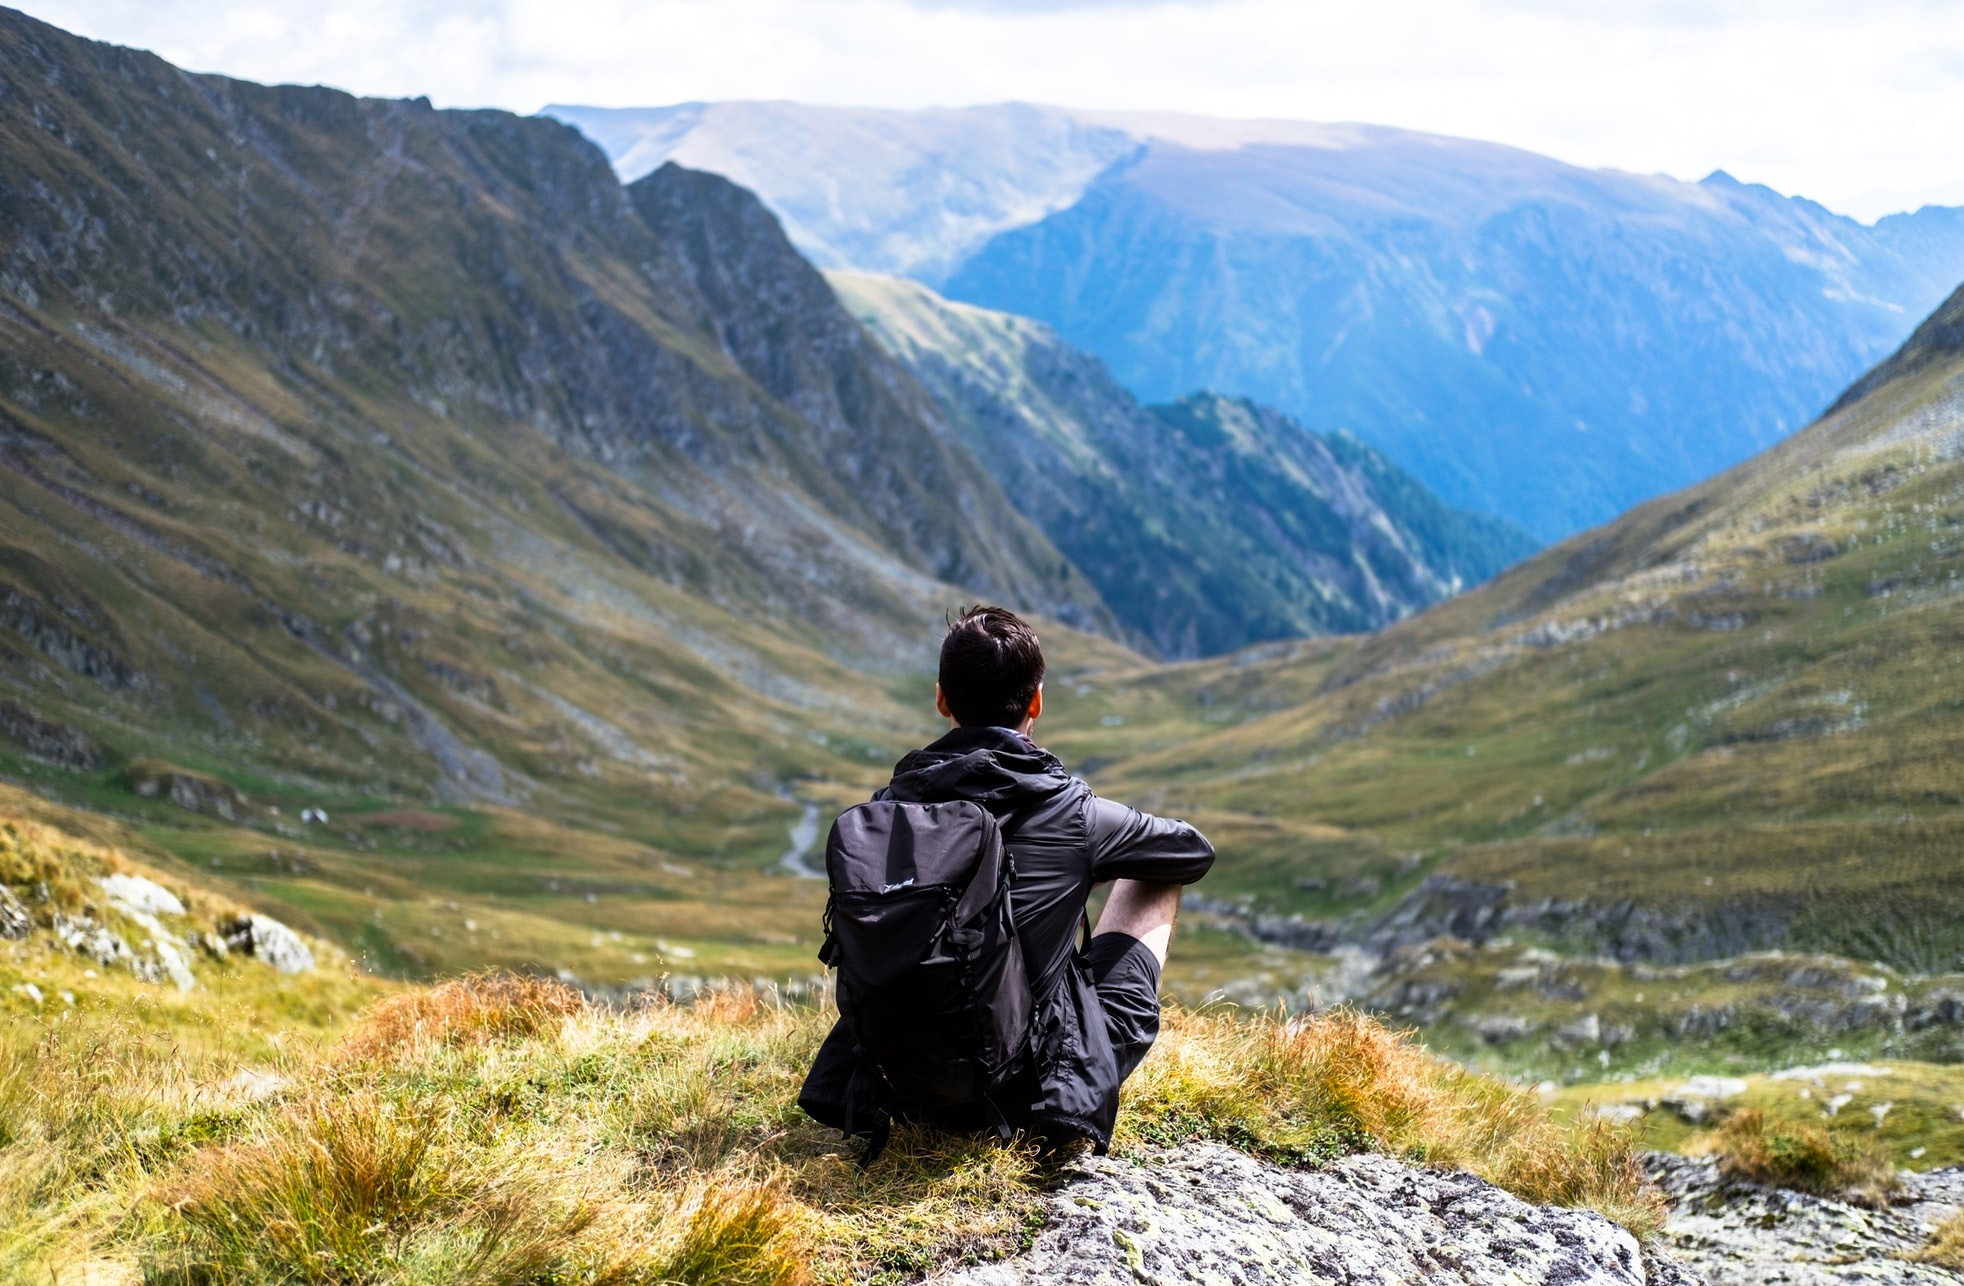 8 Days Trekking Tour - Reaching the highest peaks in Romania: Moldoveanu Peak (2544 m) & Negoiu Peak (2535 m)